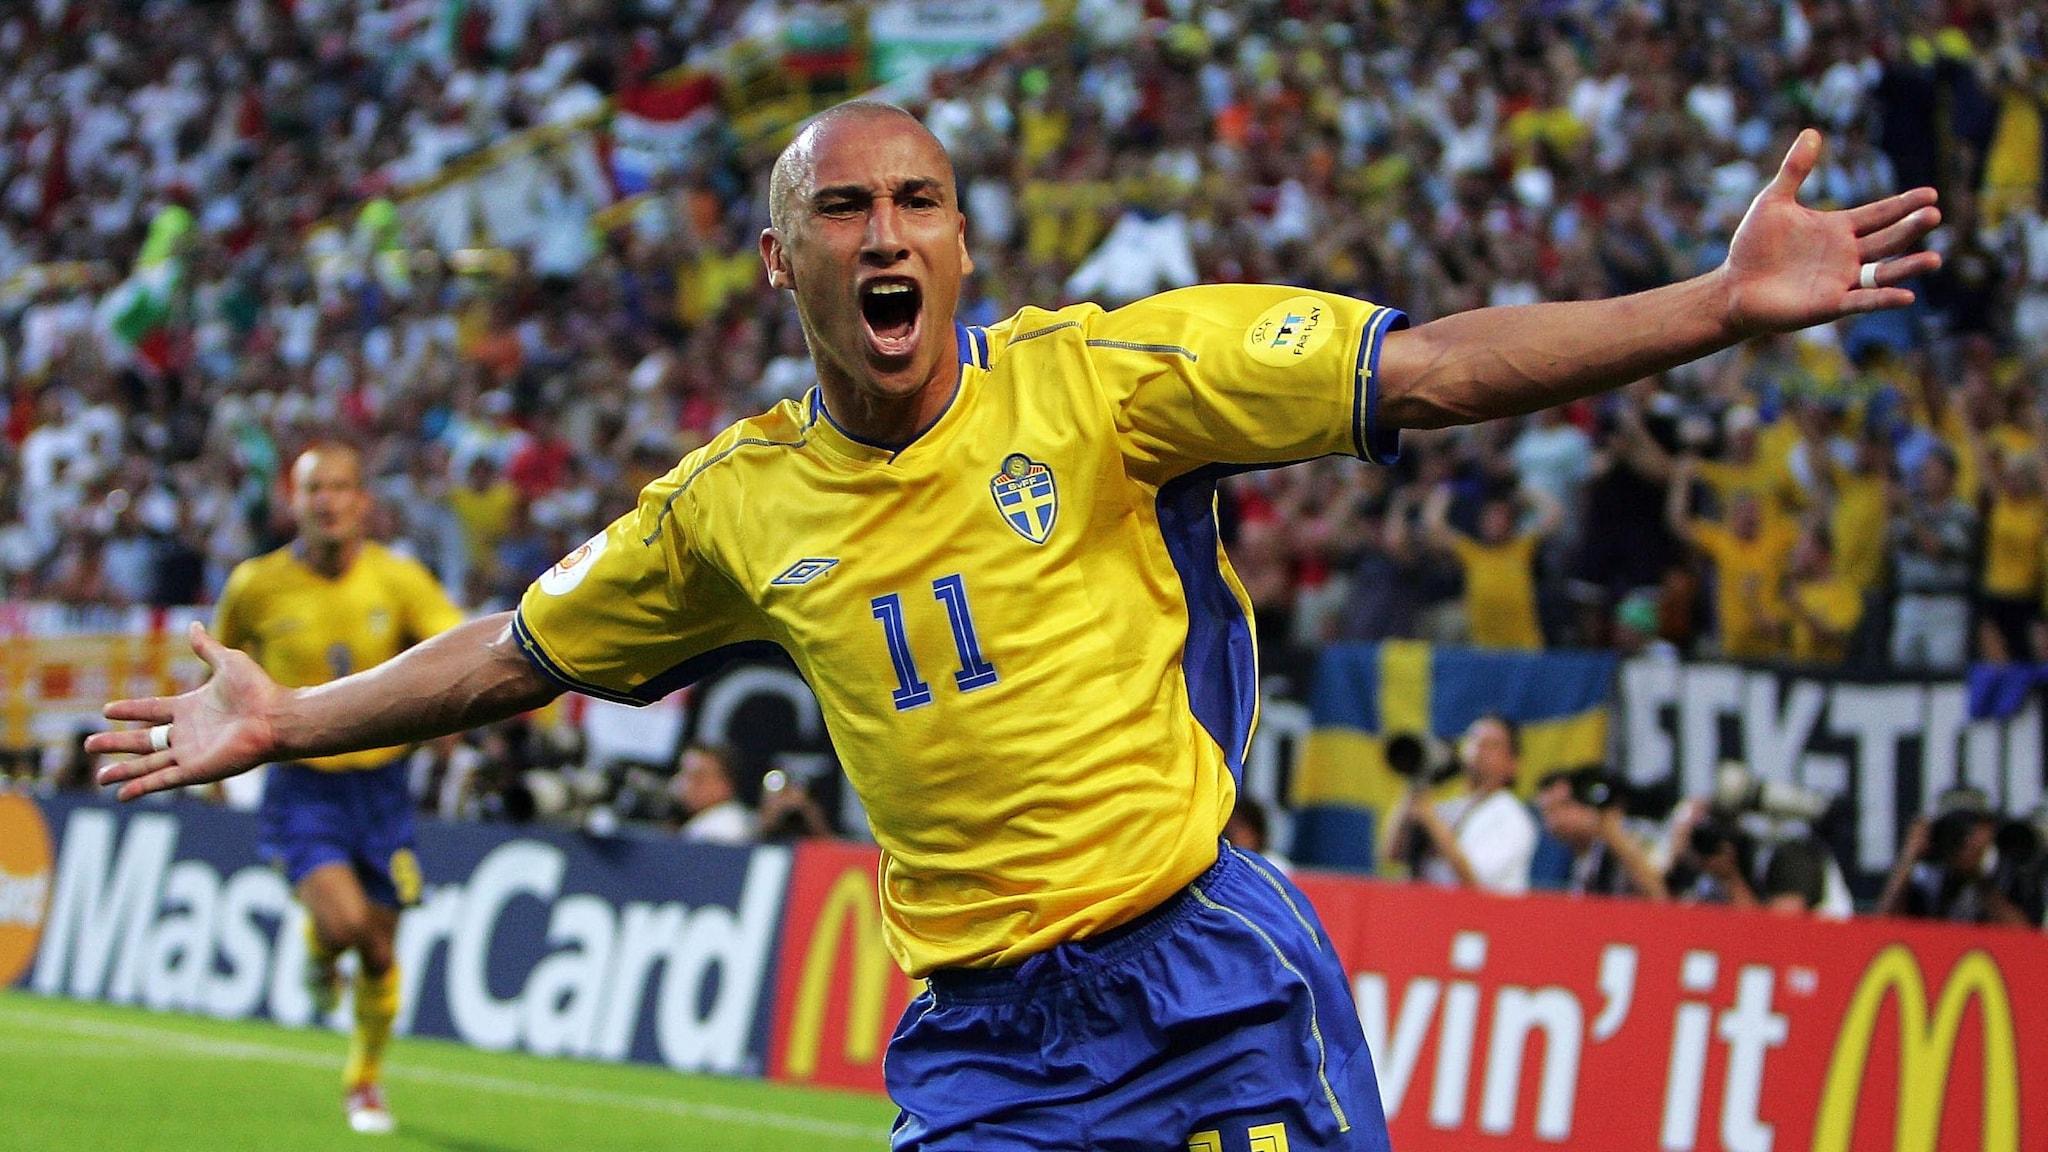 QUIZ: UEFA EURO 2004